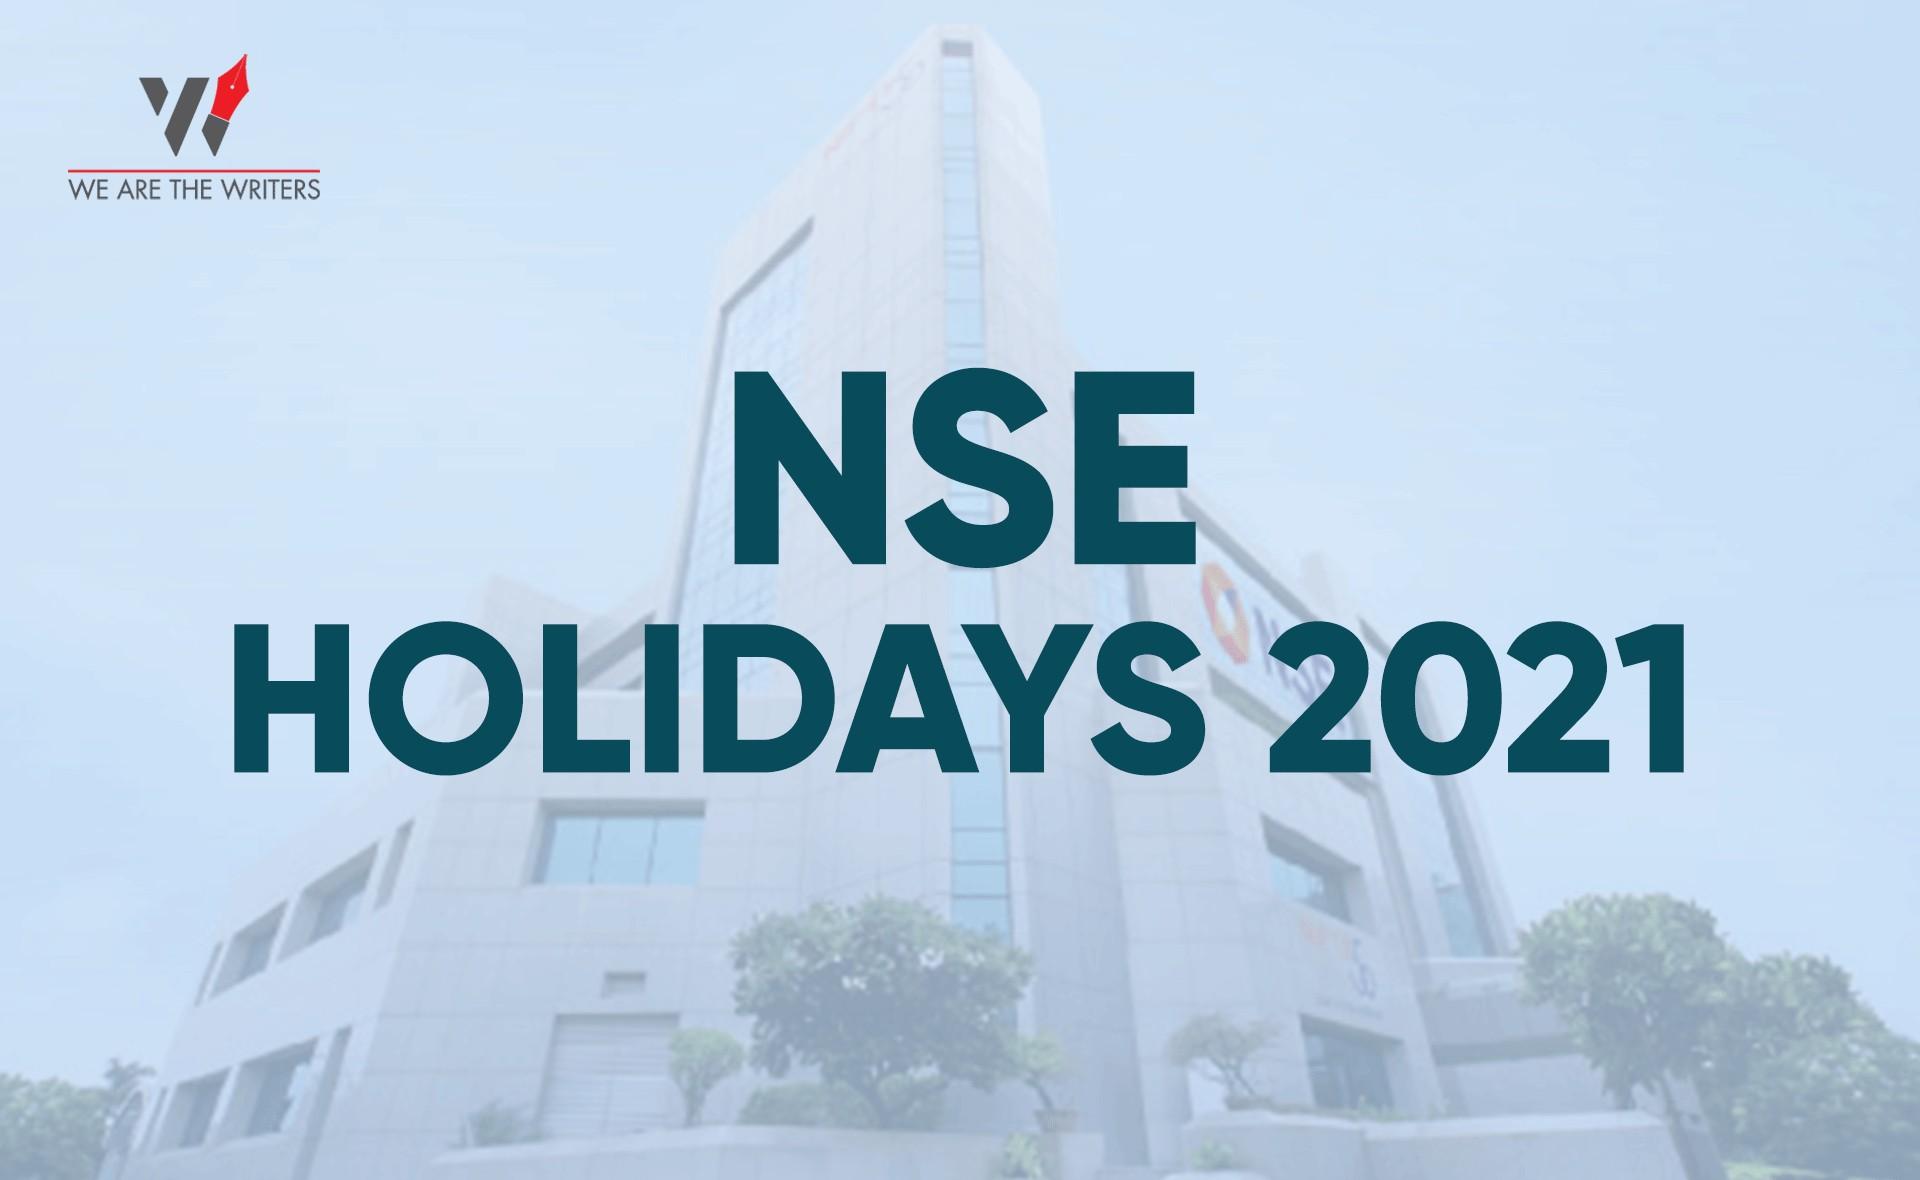 List of NSE Holidays 2021